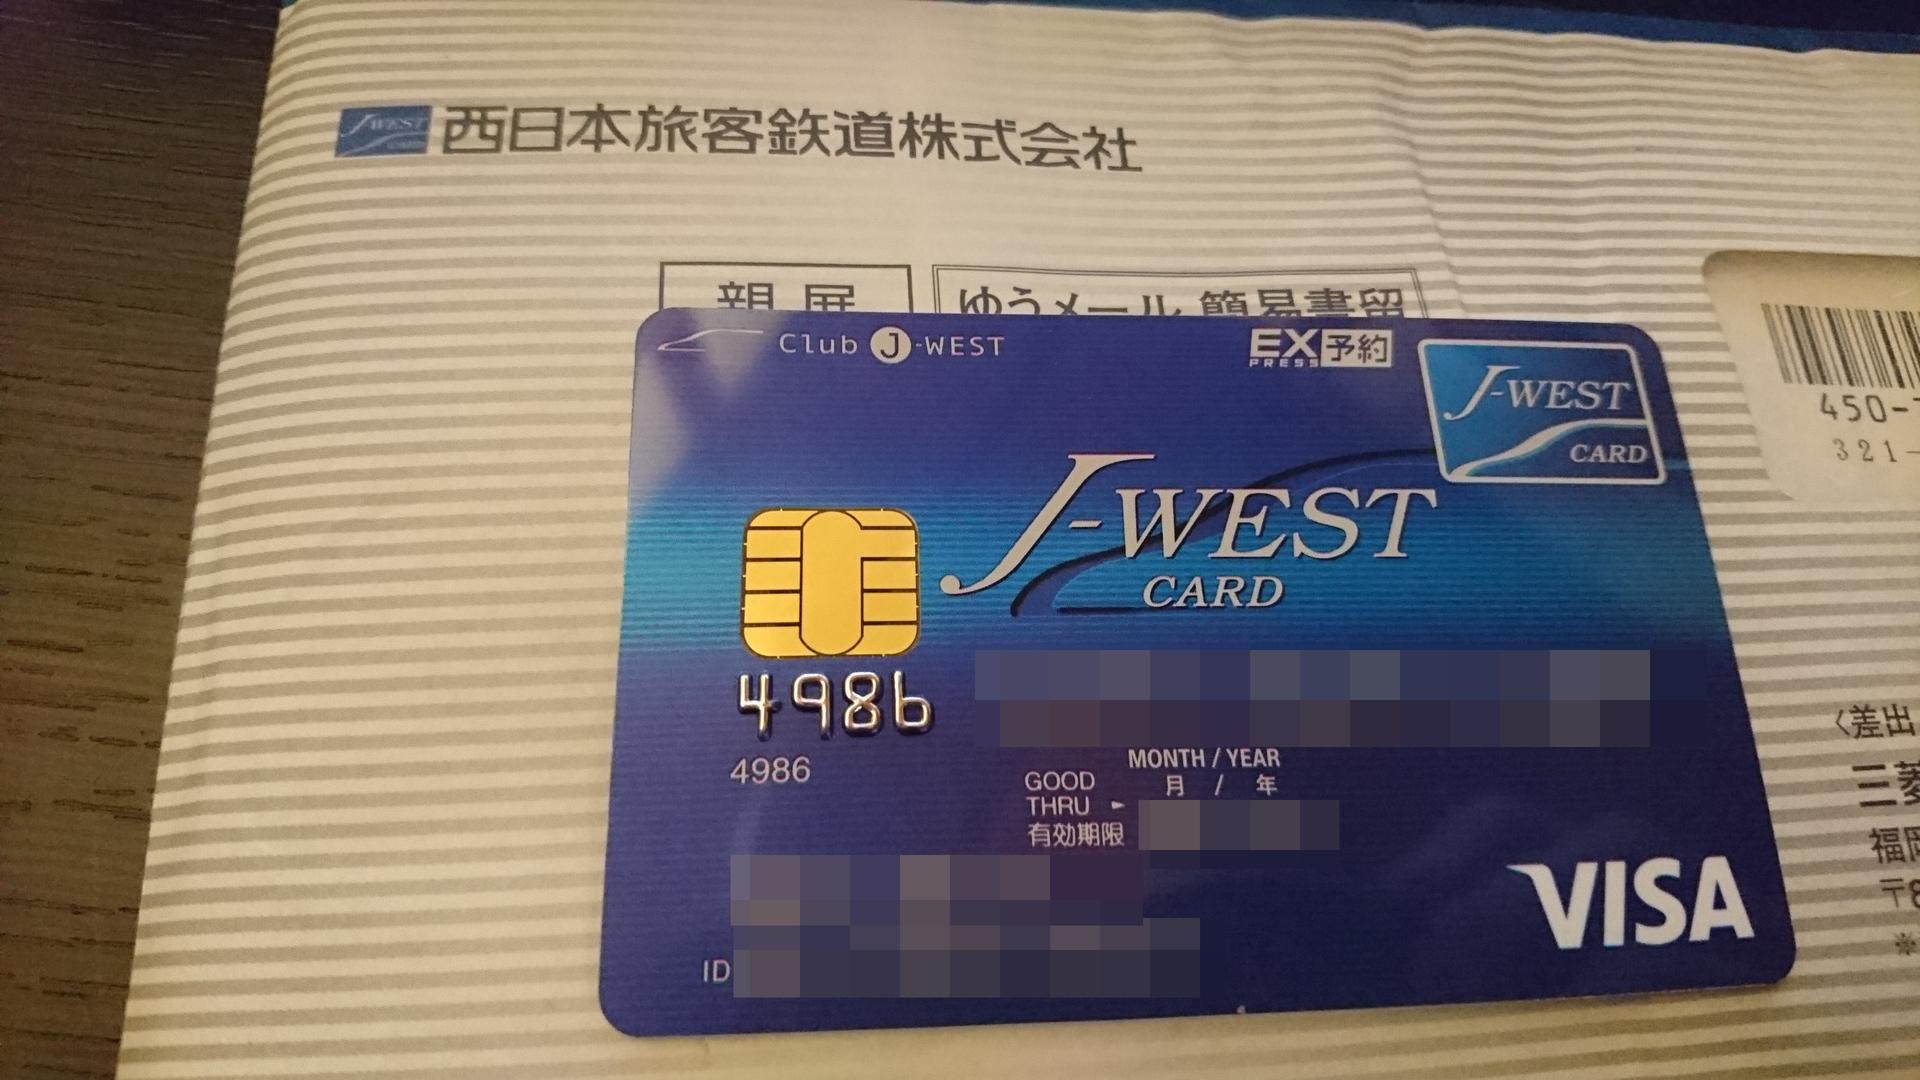 Jwest カード